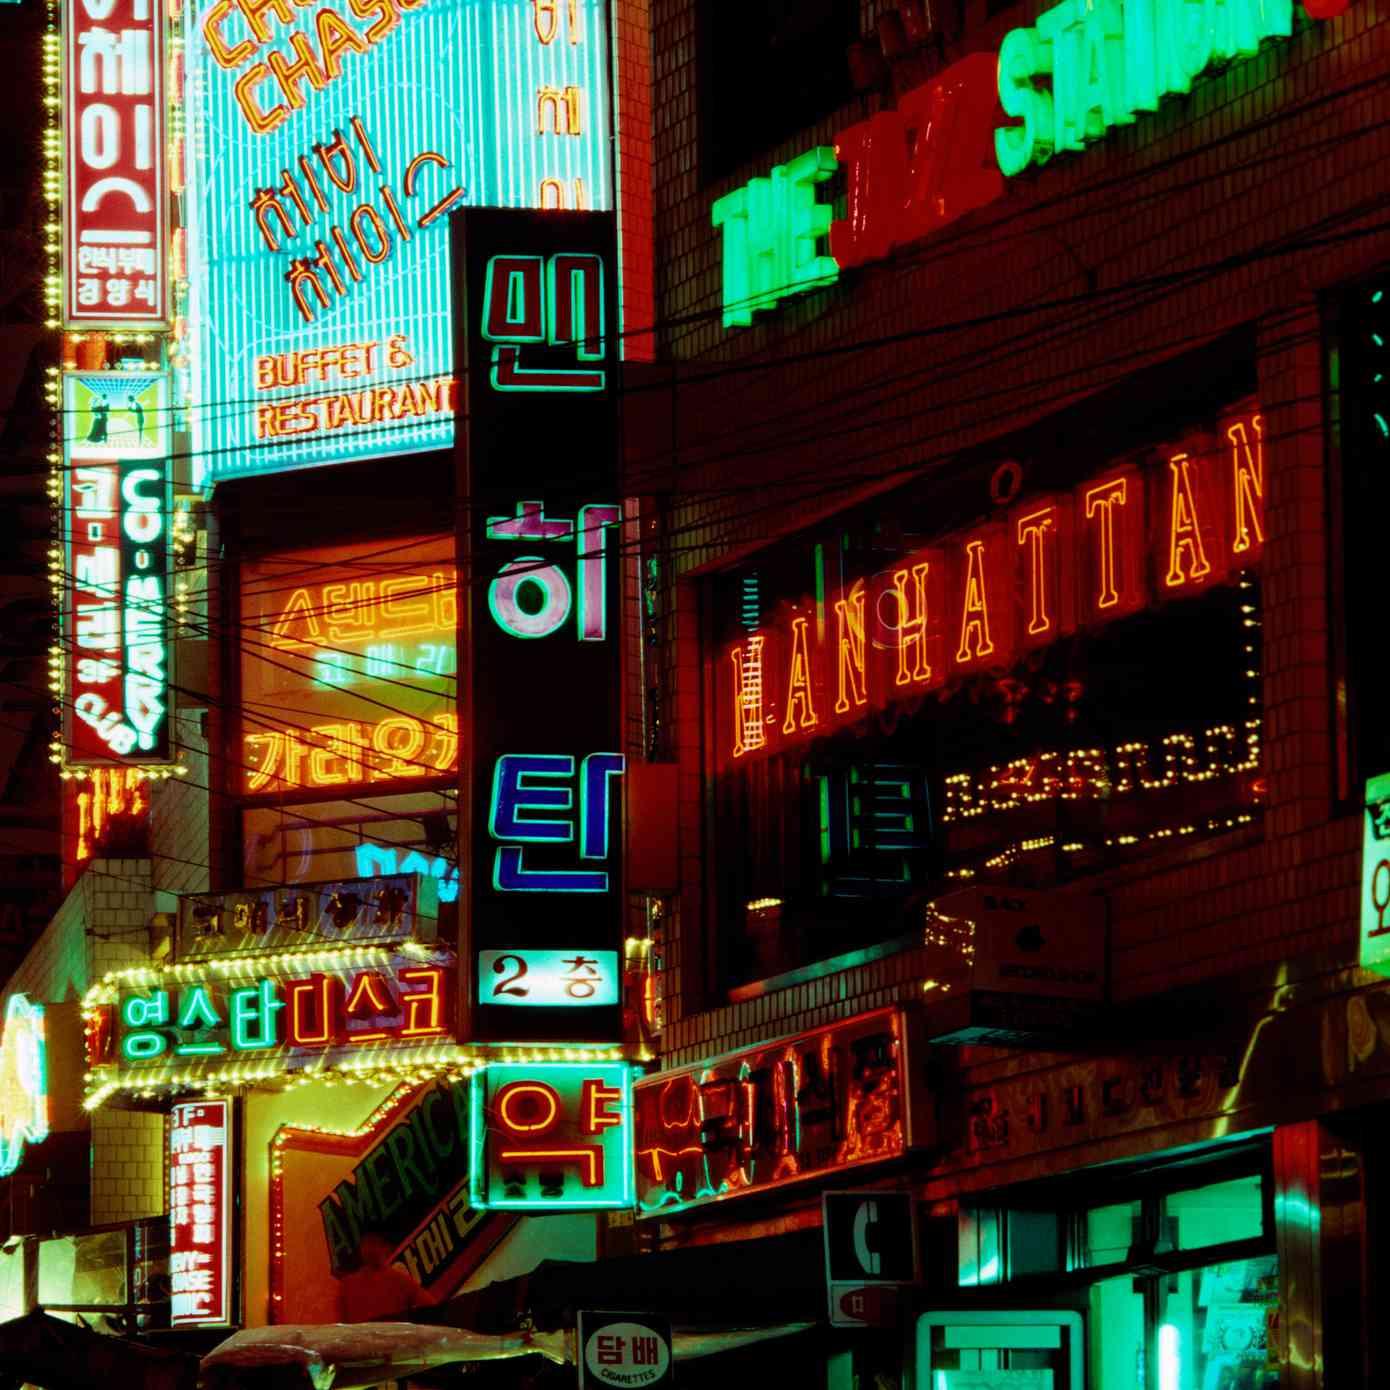 Neon signs in Itaewon night club area.